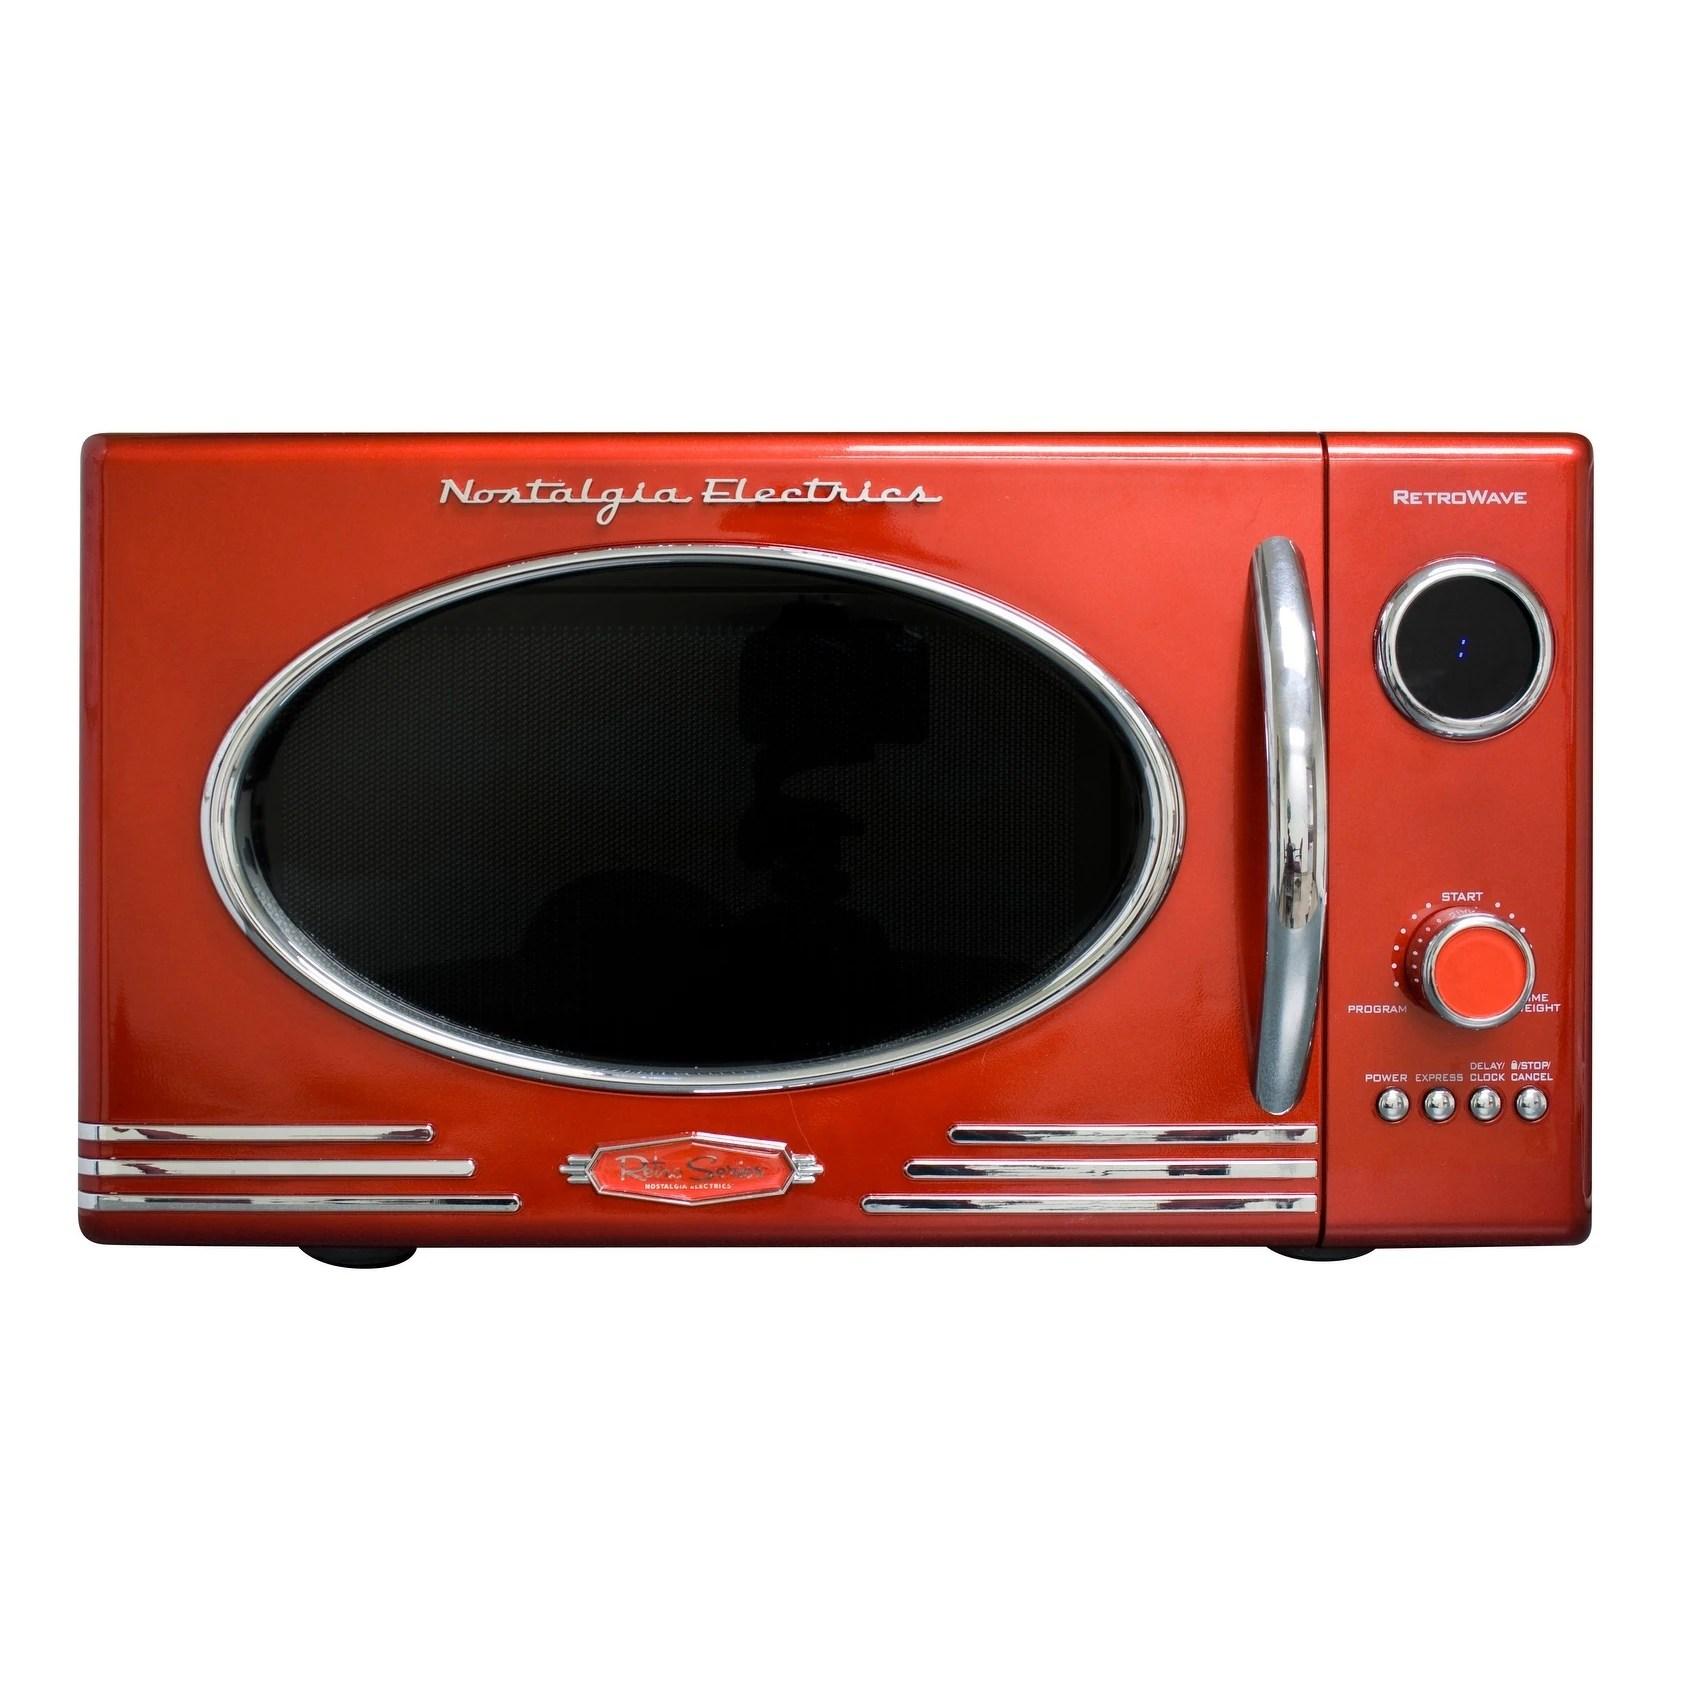 nostalgia rmo4rr retro 0 9 cu ft microwave oven retro red